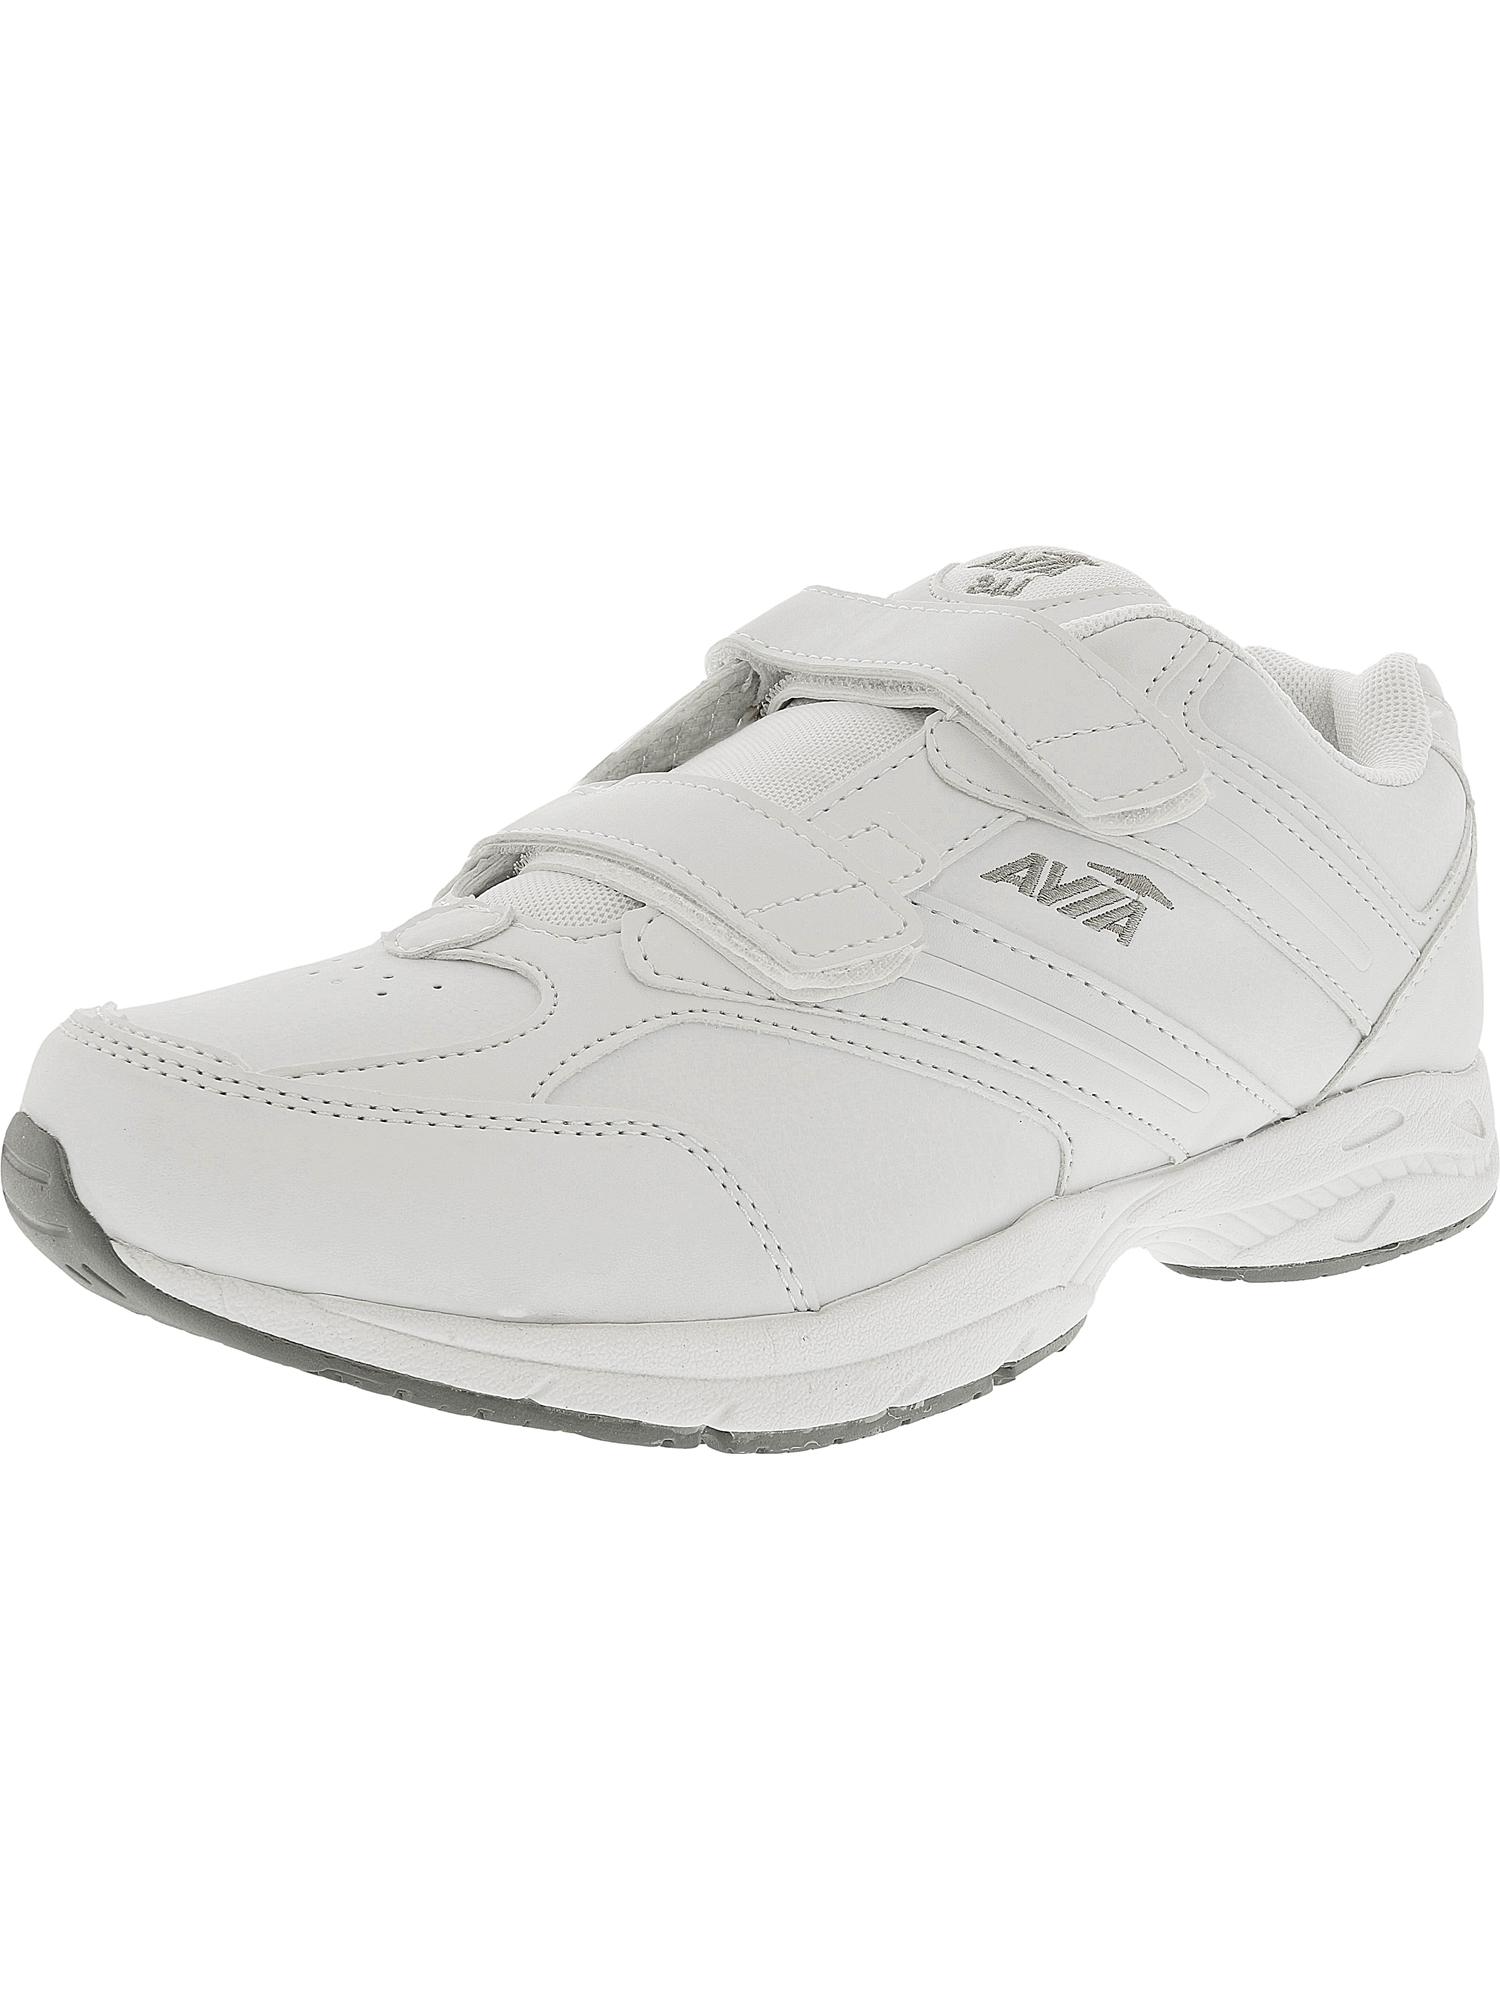 Avia Men's Union Slip Resistant White / Chrome Silver Lemon Yellow Ankle-High Leather Walking Shoe - 10.5M